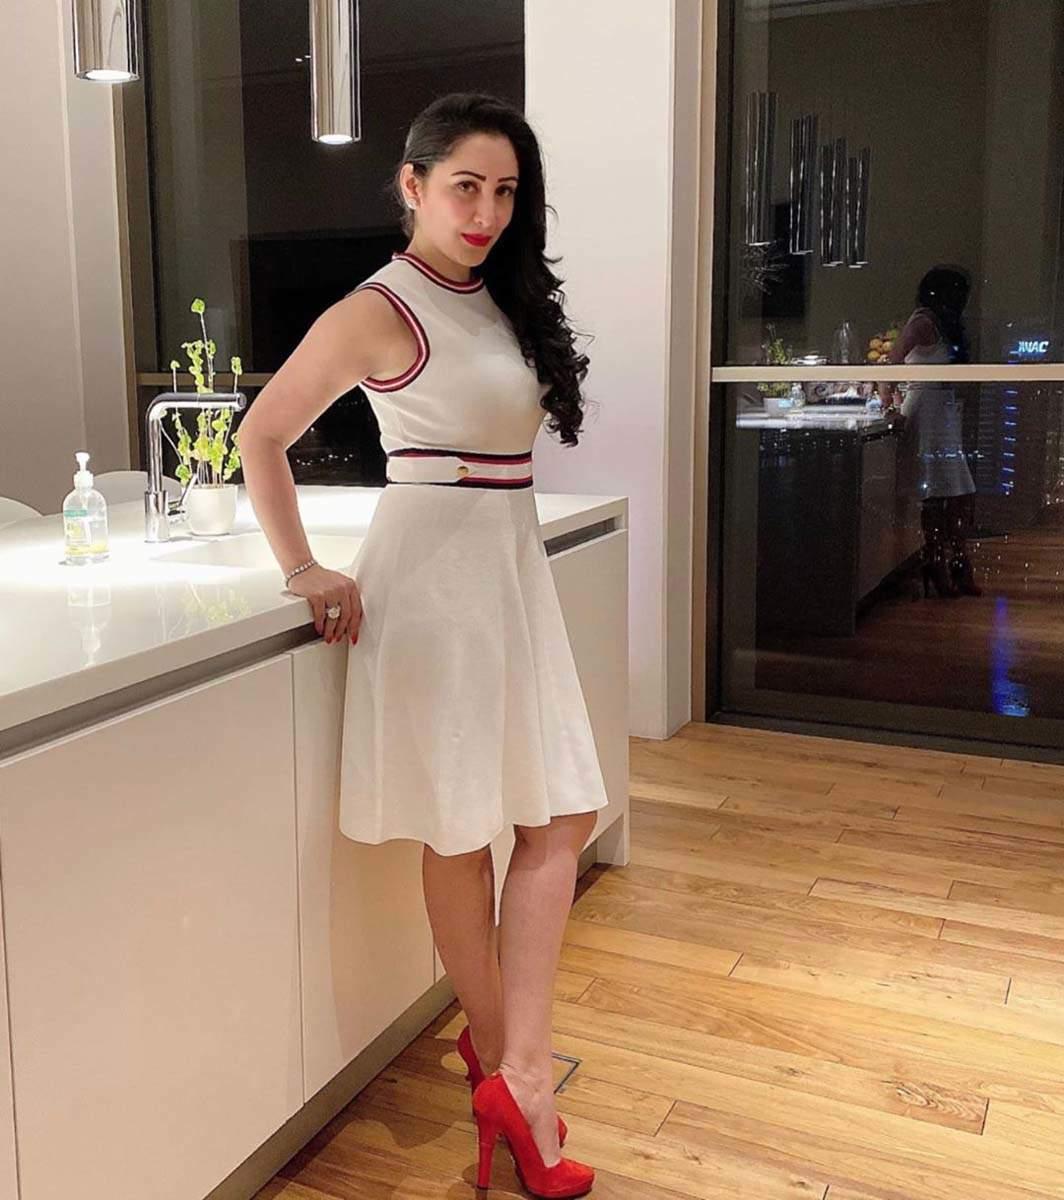 Glamorous pictures of Sanjay Dutt's beautiful wife Maanayata Dutt